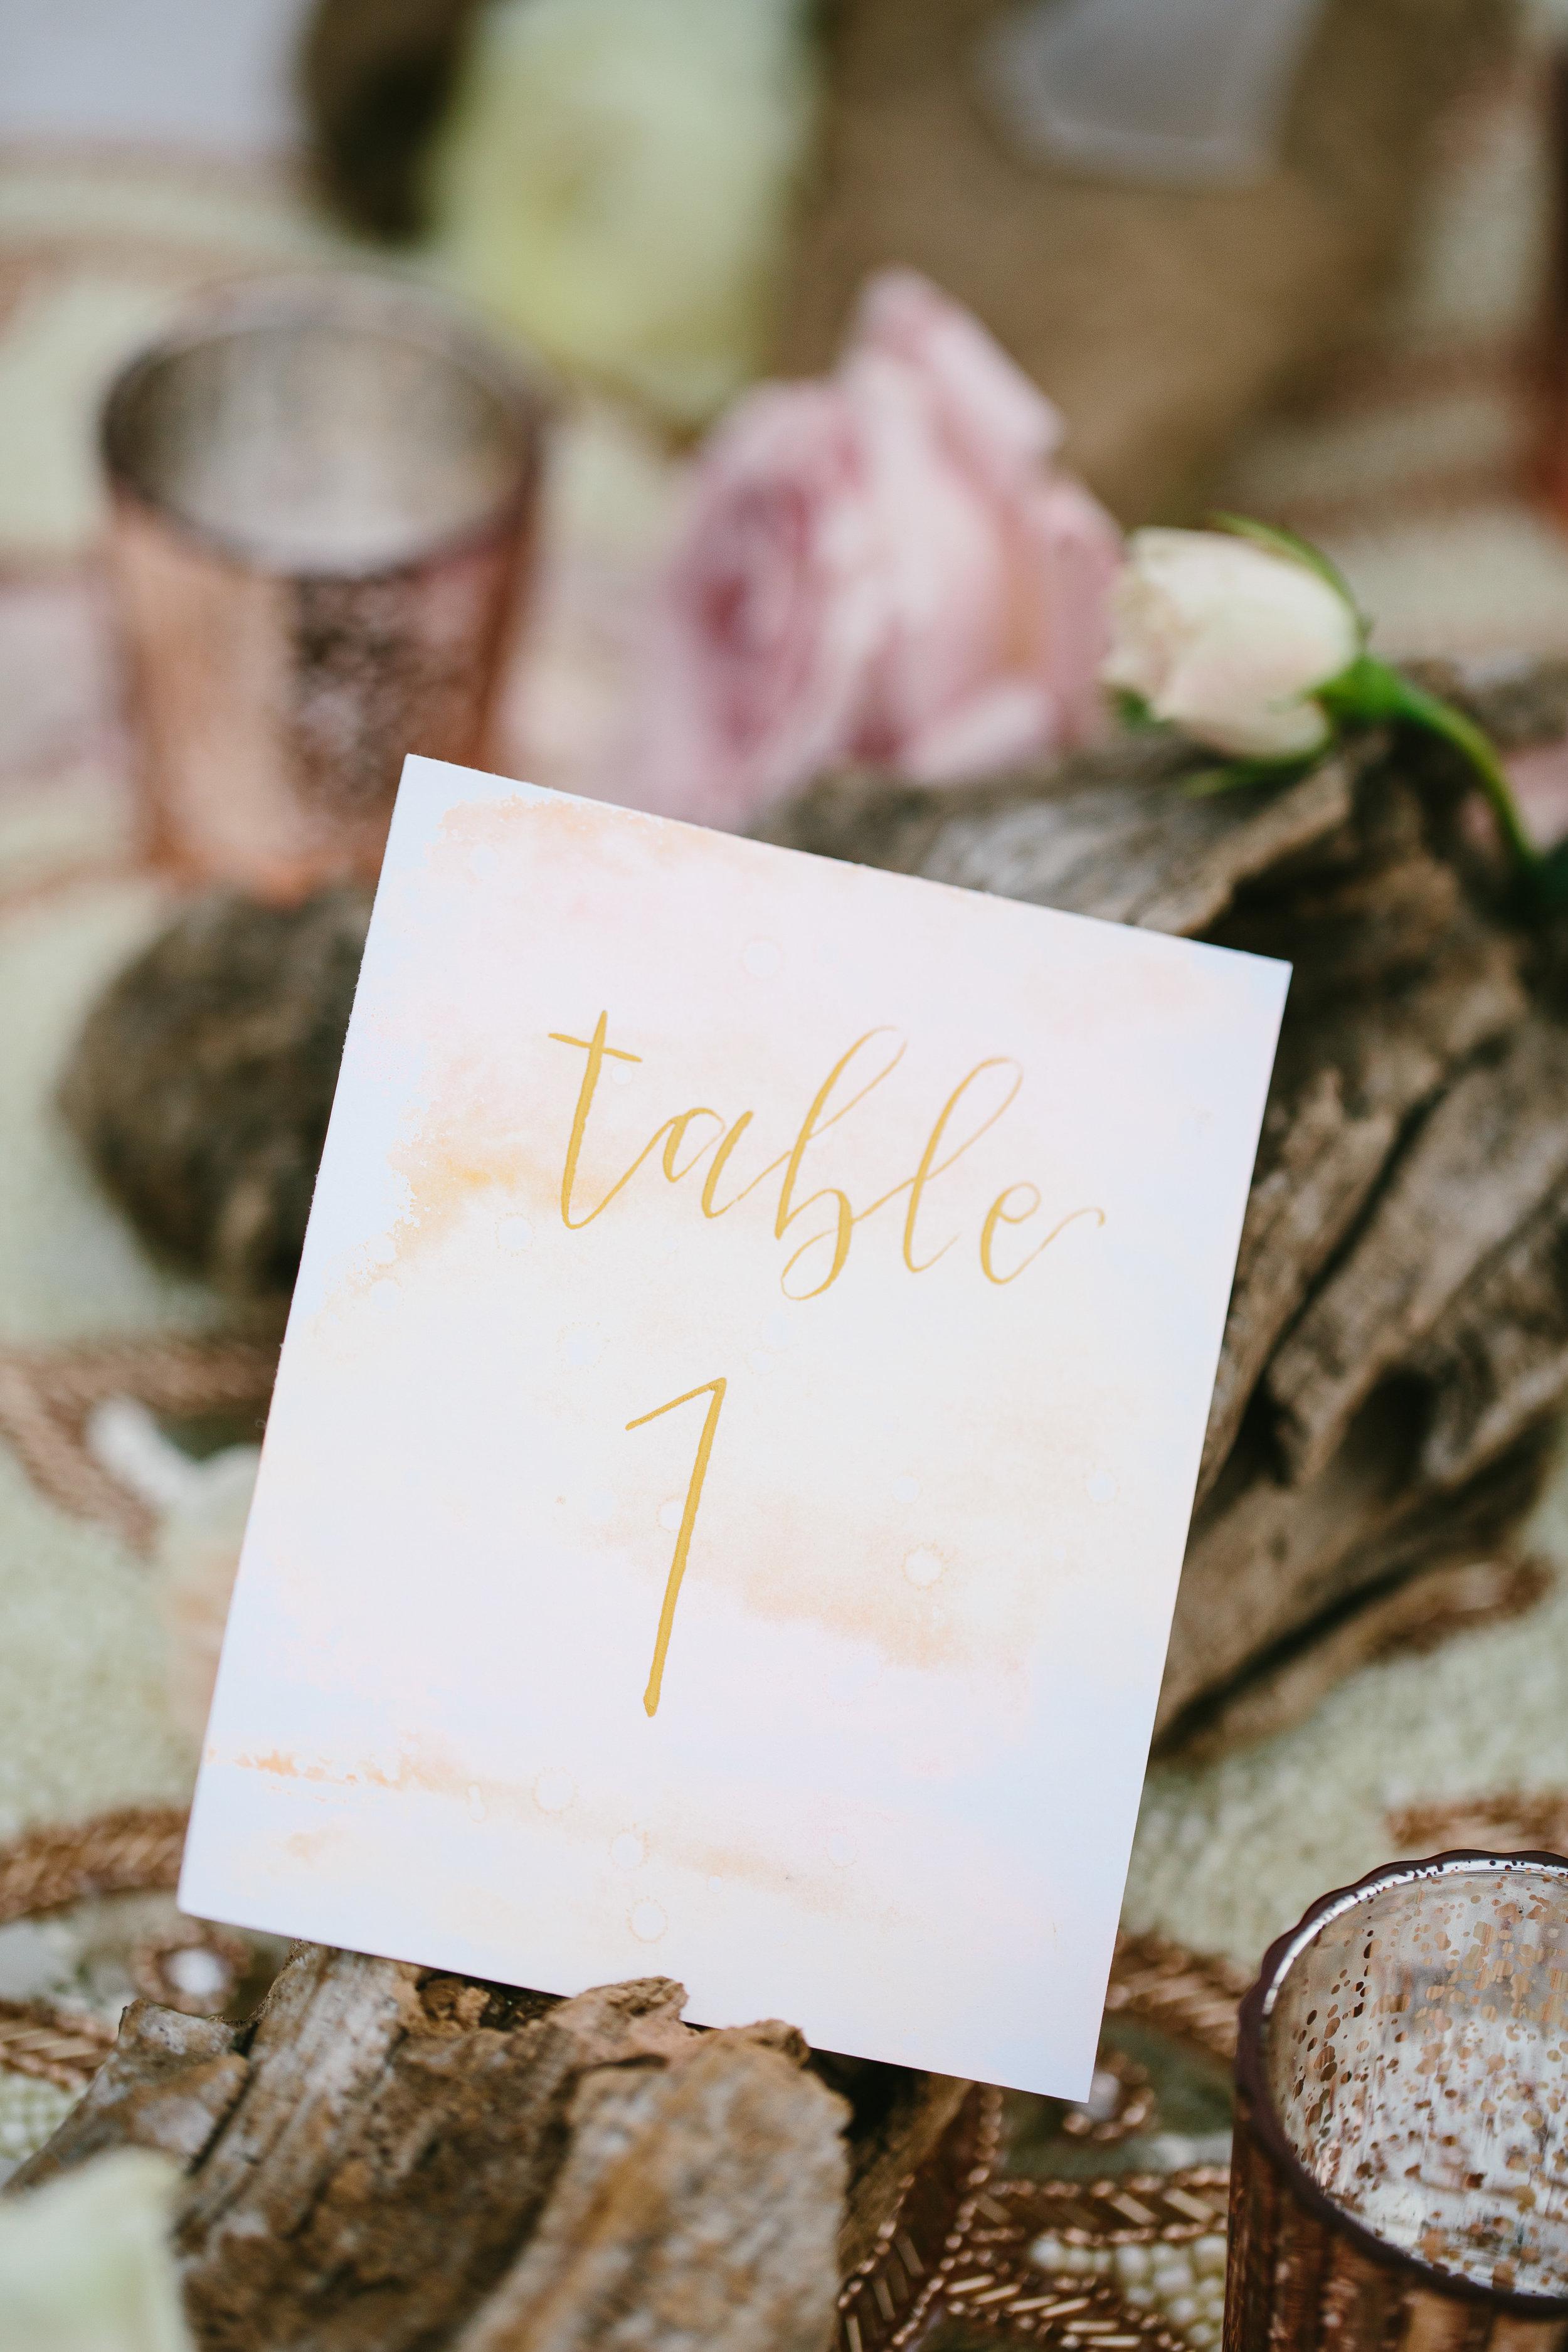 Engaged-Asheville-Joy-Unscripted-Wedding-Calligrapher-Rachael-McIntosh-Photography-6.jpg